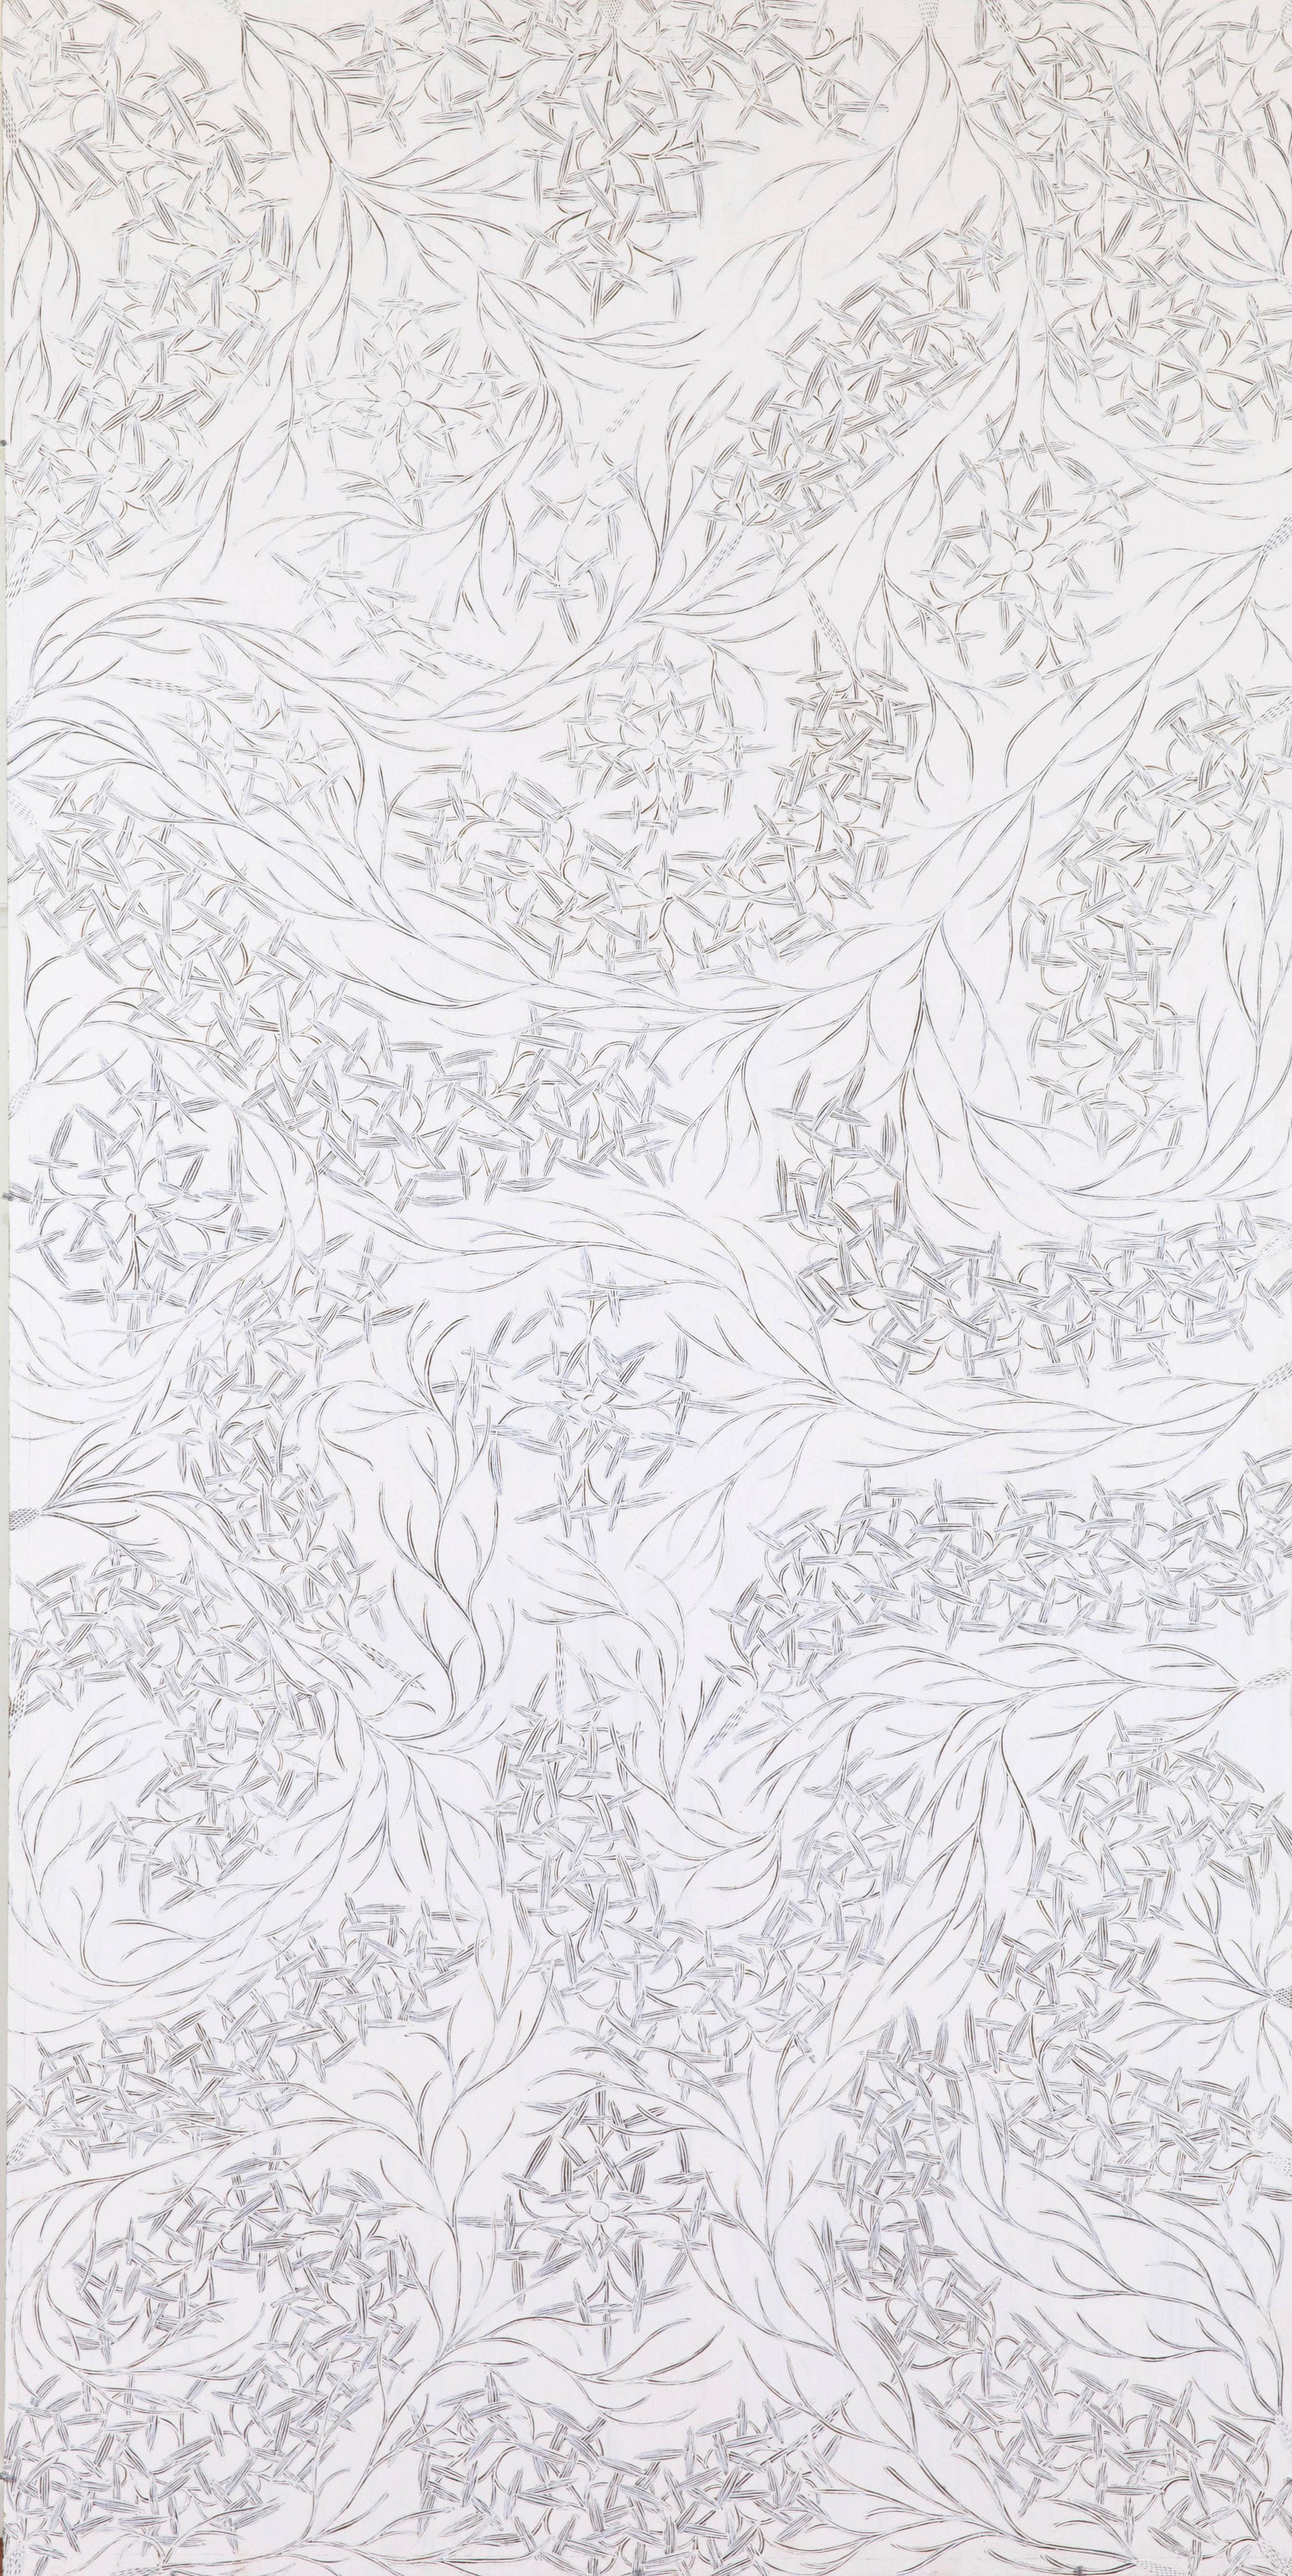 "DJIRRIRRIA WUNUNGMURRA  Yukuwa  Natural pigments on board 95"" x 47"" (240 x 120 cm) Buku Arts Catalog #4655P   EMAIL INQUIRY"